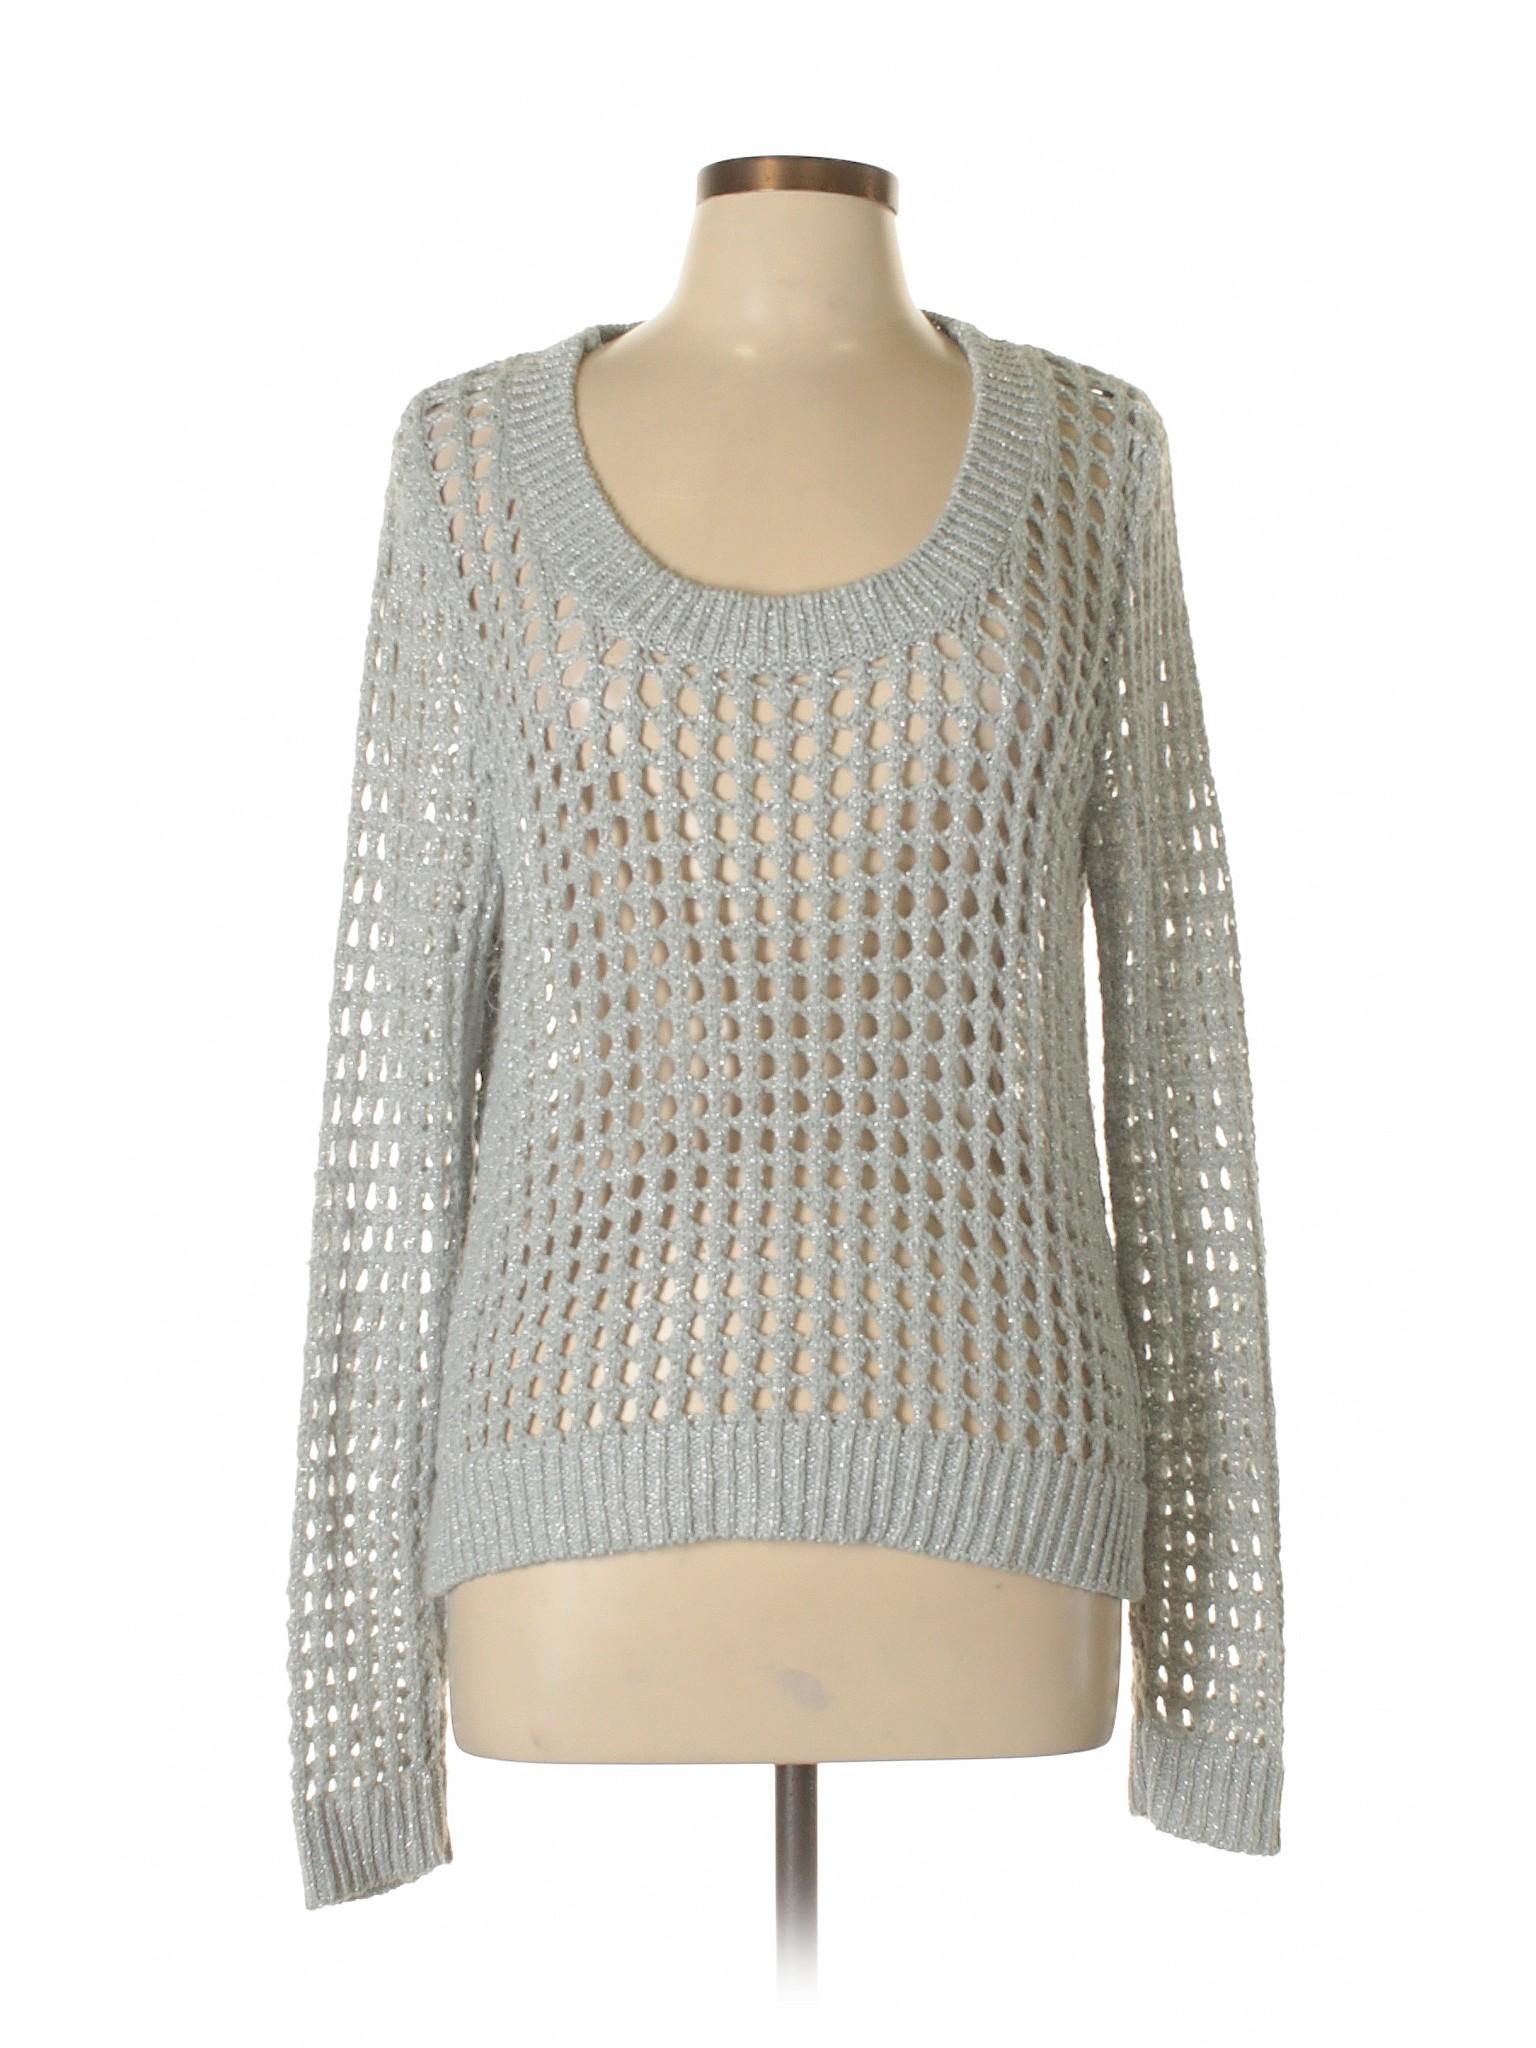 Sweater Jordache Pullover Sweater Boutique Sweater Jordache Pullover Pullover Jordache Boutique Boutique Sweater Boutique Pullover Jordache Boutique Jordache AXUEqE